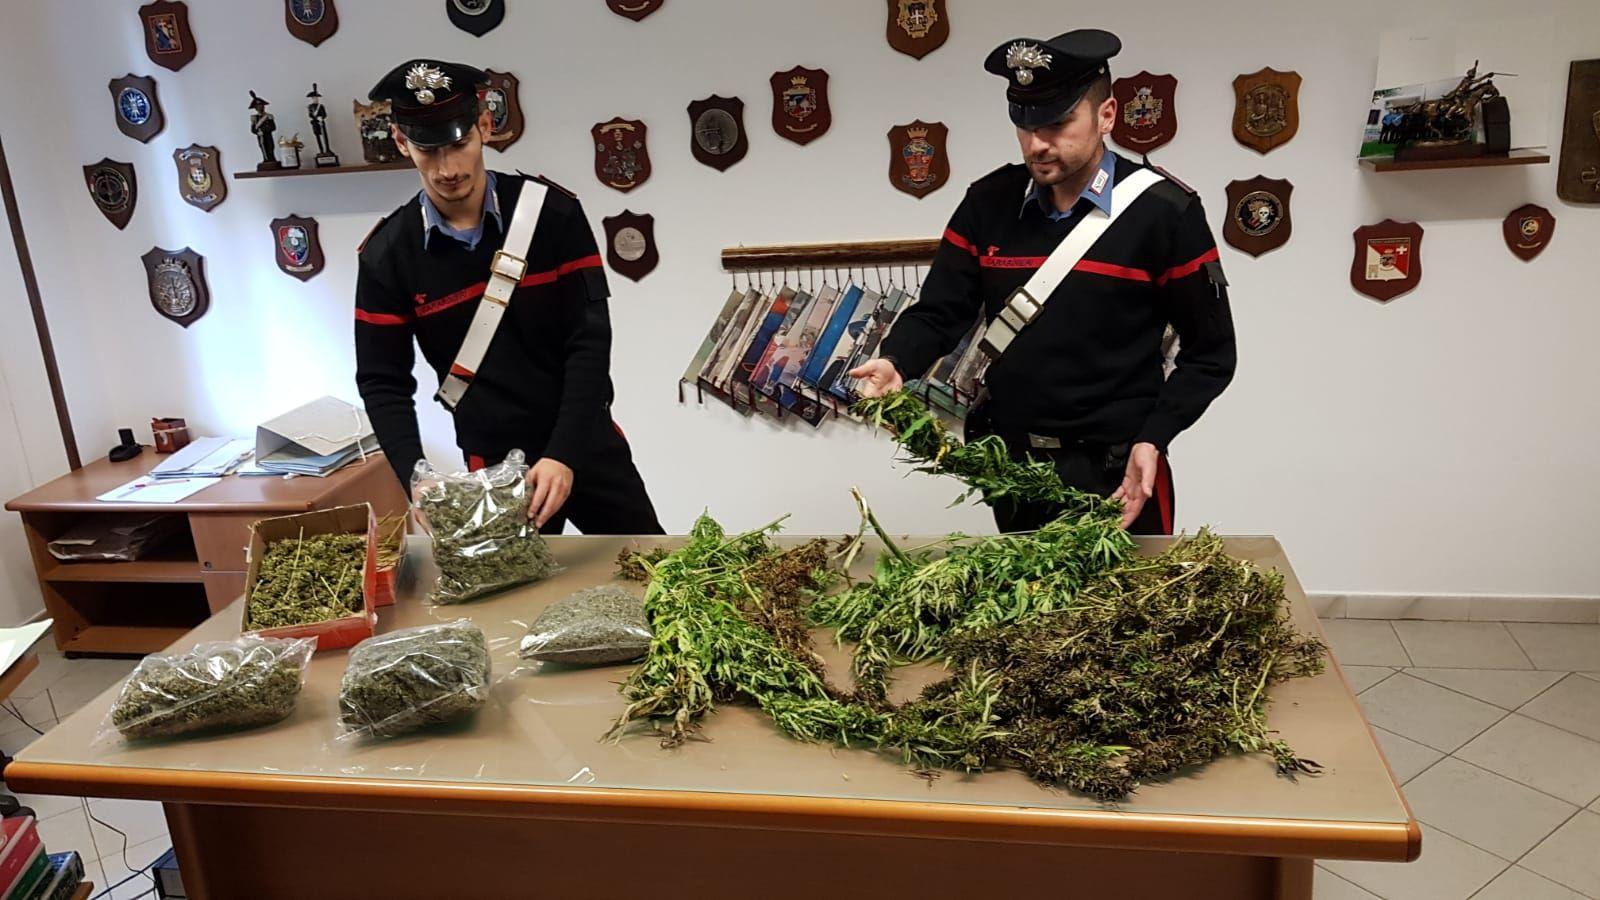 LEINI - Operazione antidroga: recuperati 17 chili di marijuana